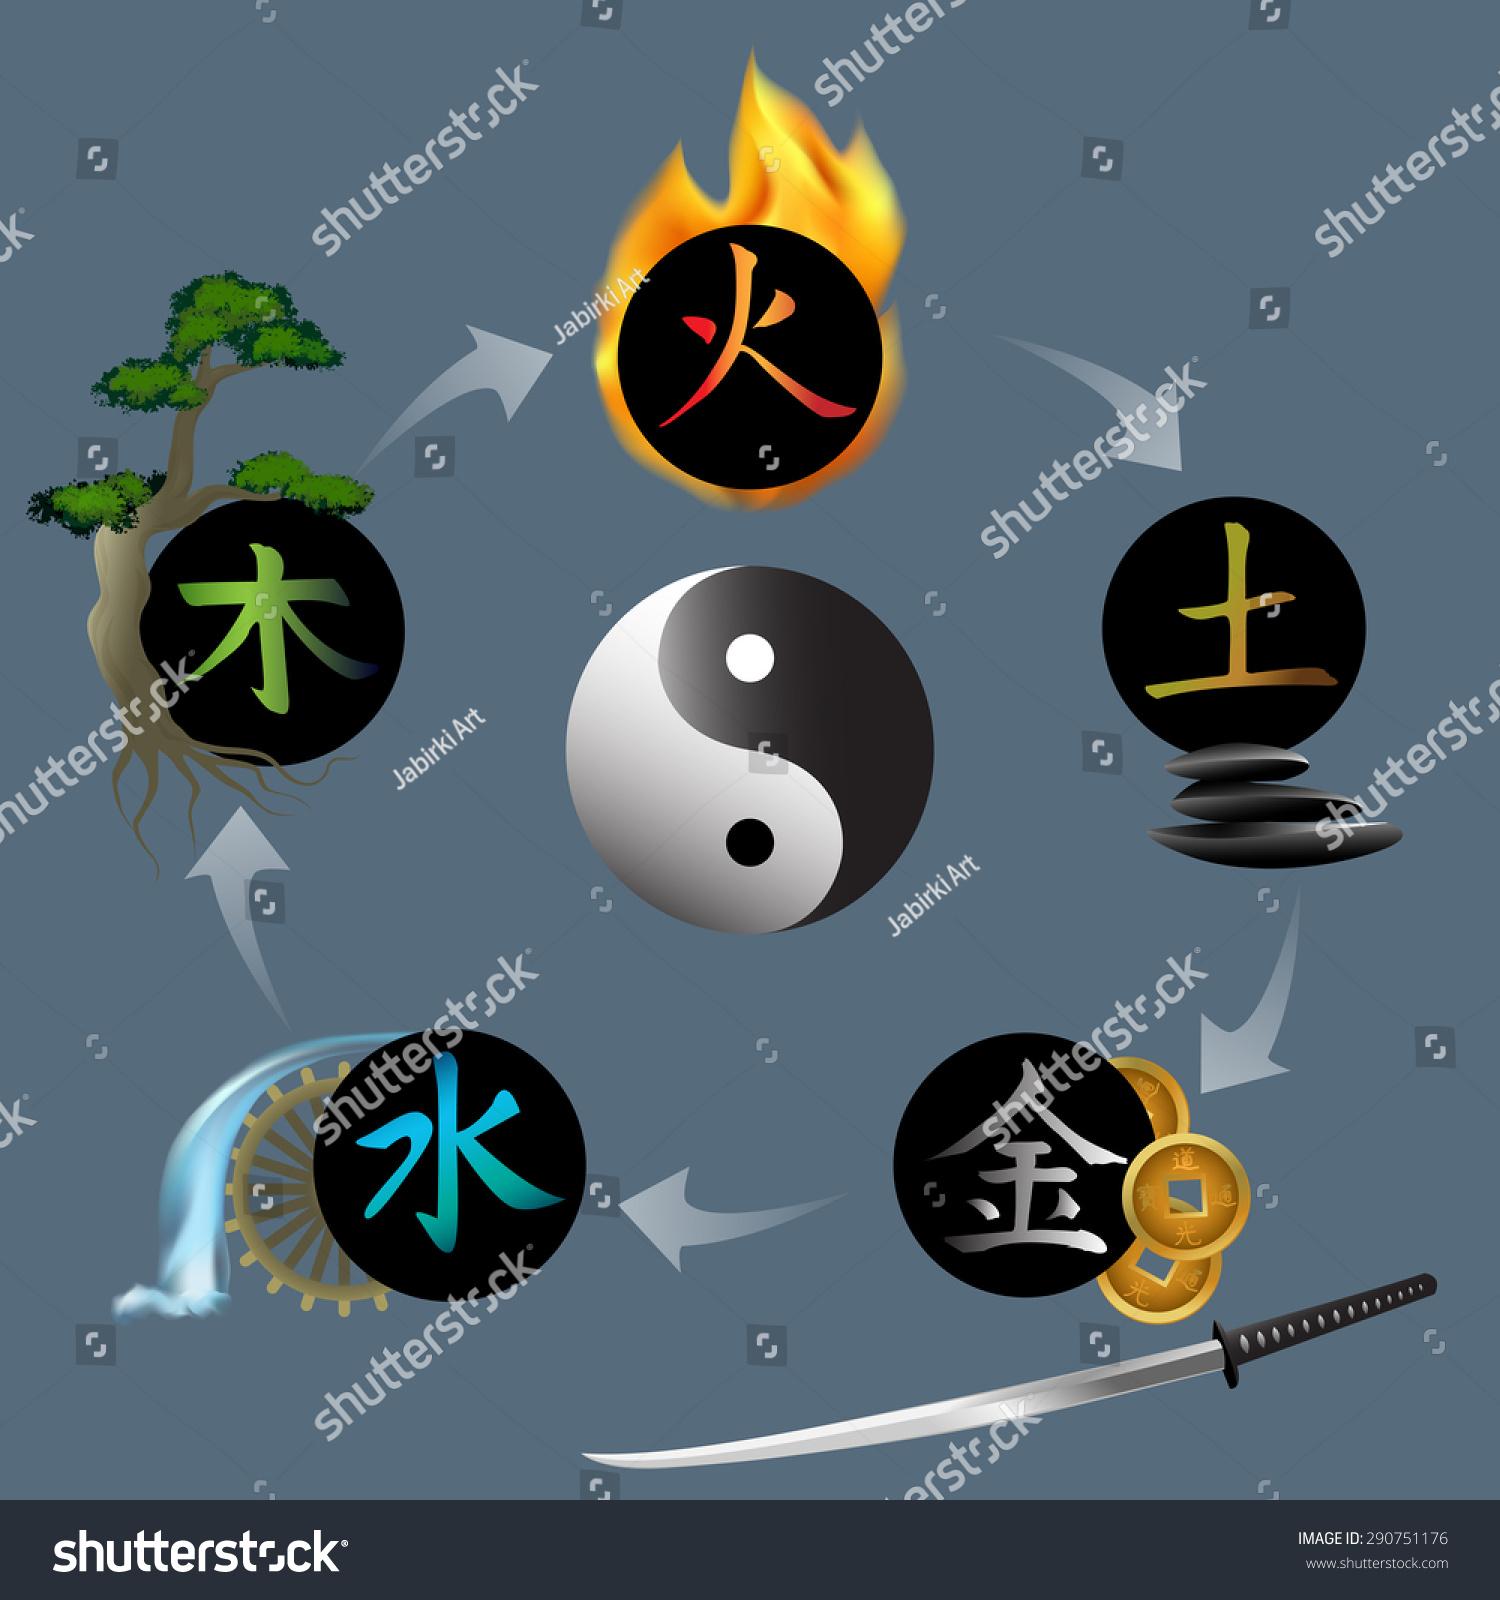 Vector Illustration Five Elements Yin Yang Stock Vector